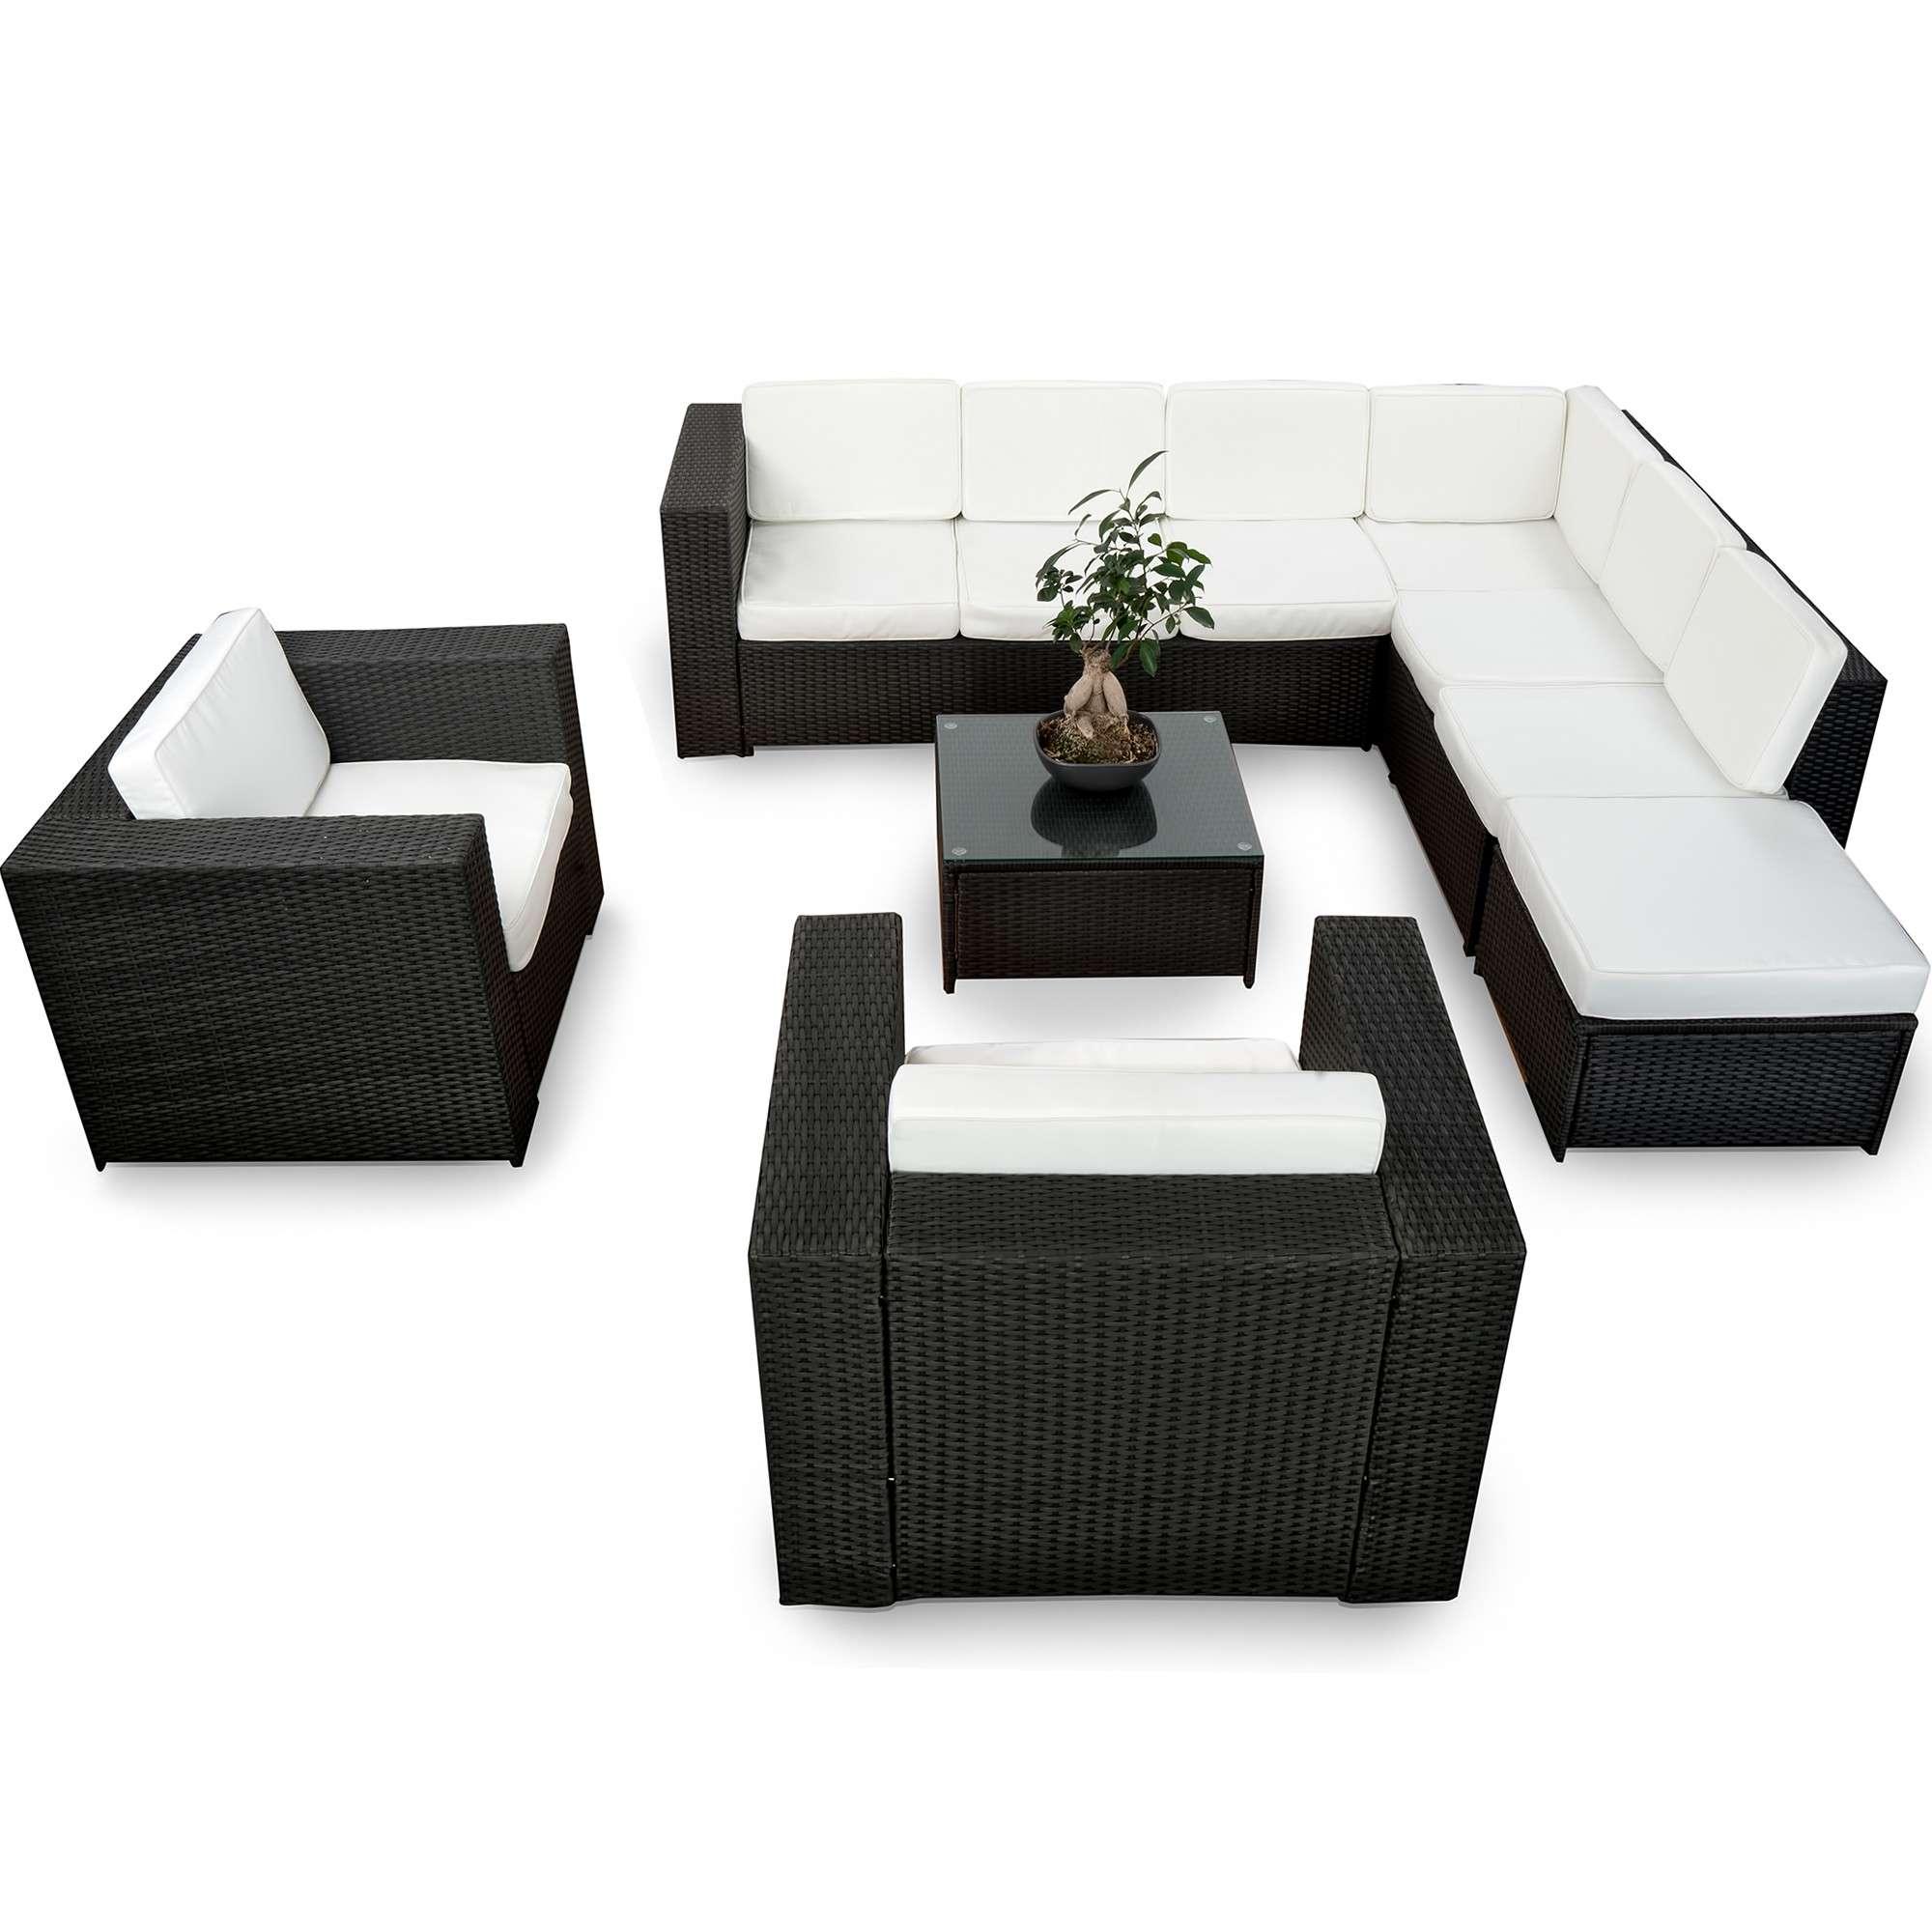 loungeset 2 personen amazing lounge set sunbrella grau sitzer arezzo ii with loungeset 2. Black Bedroom Furniture Sets. Home Design Ideas